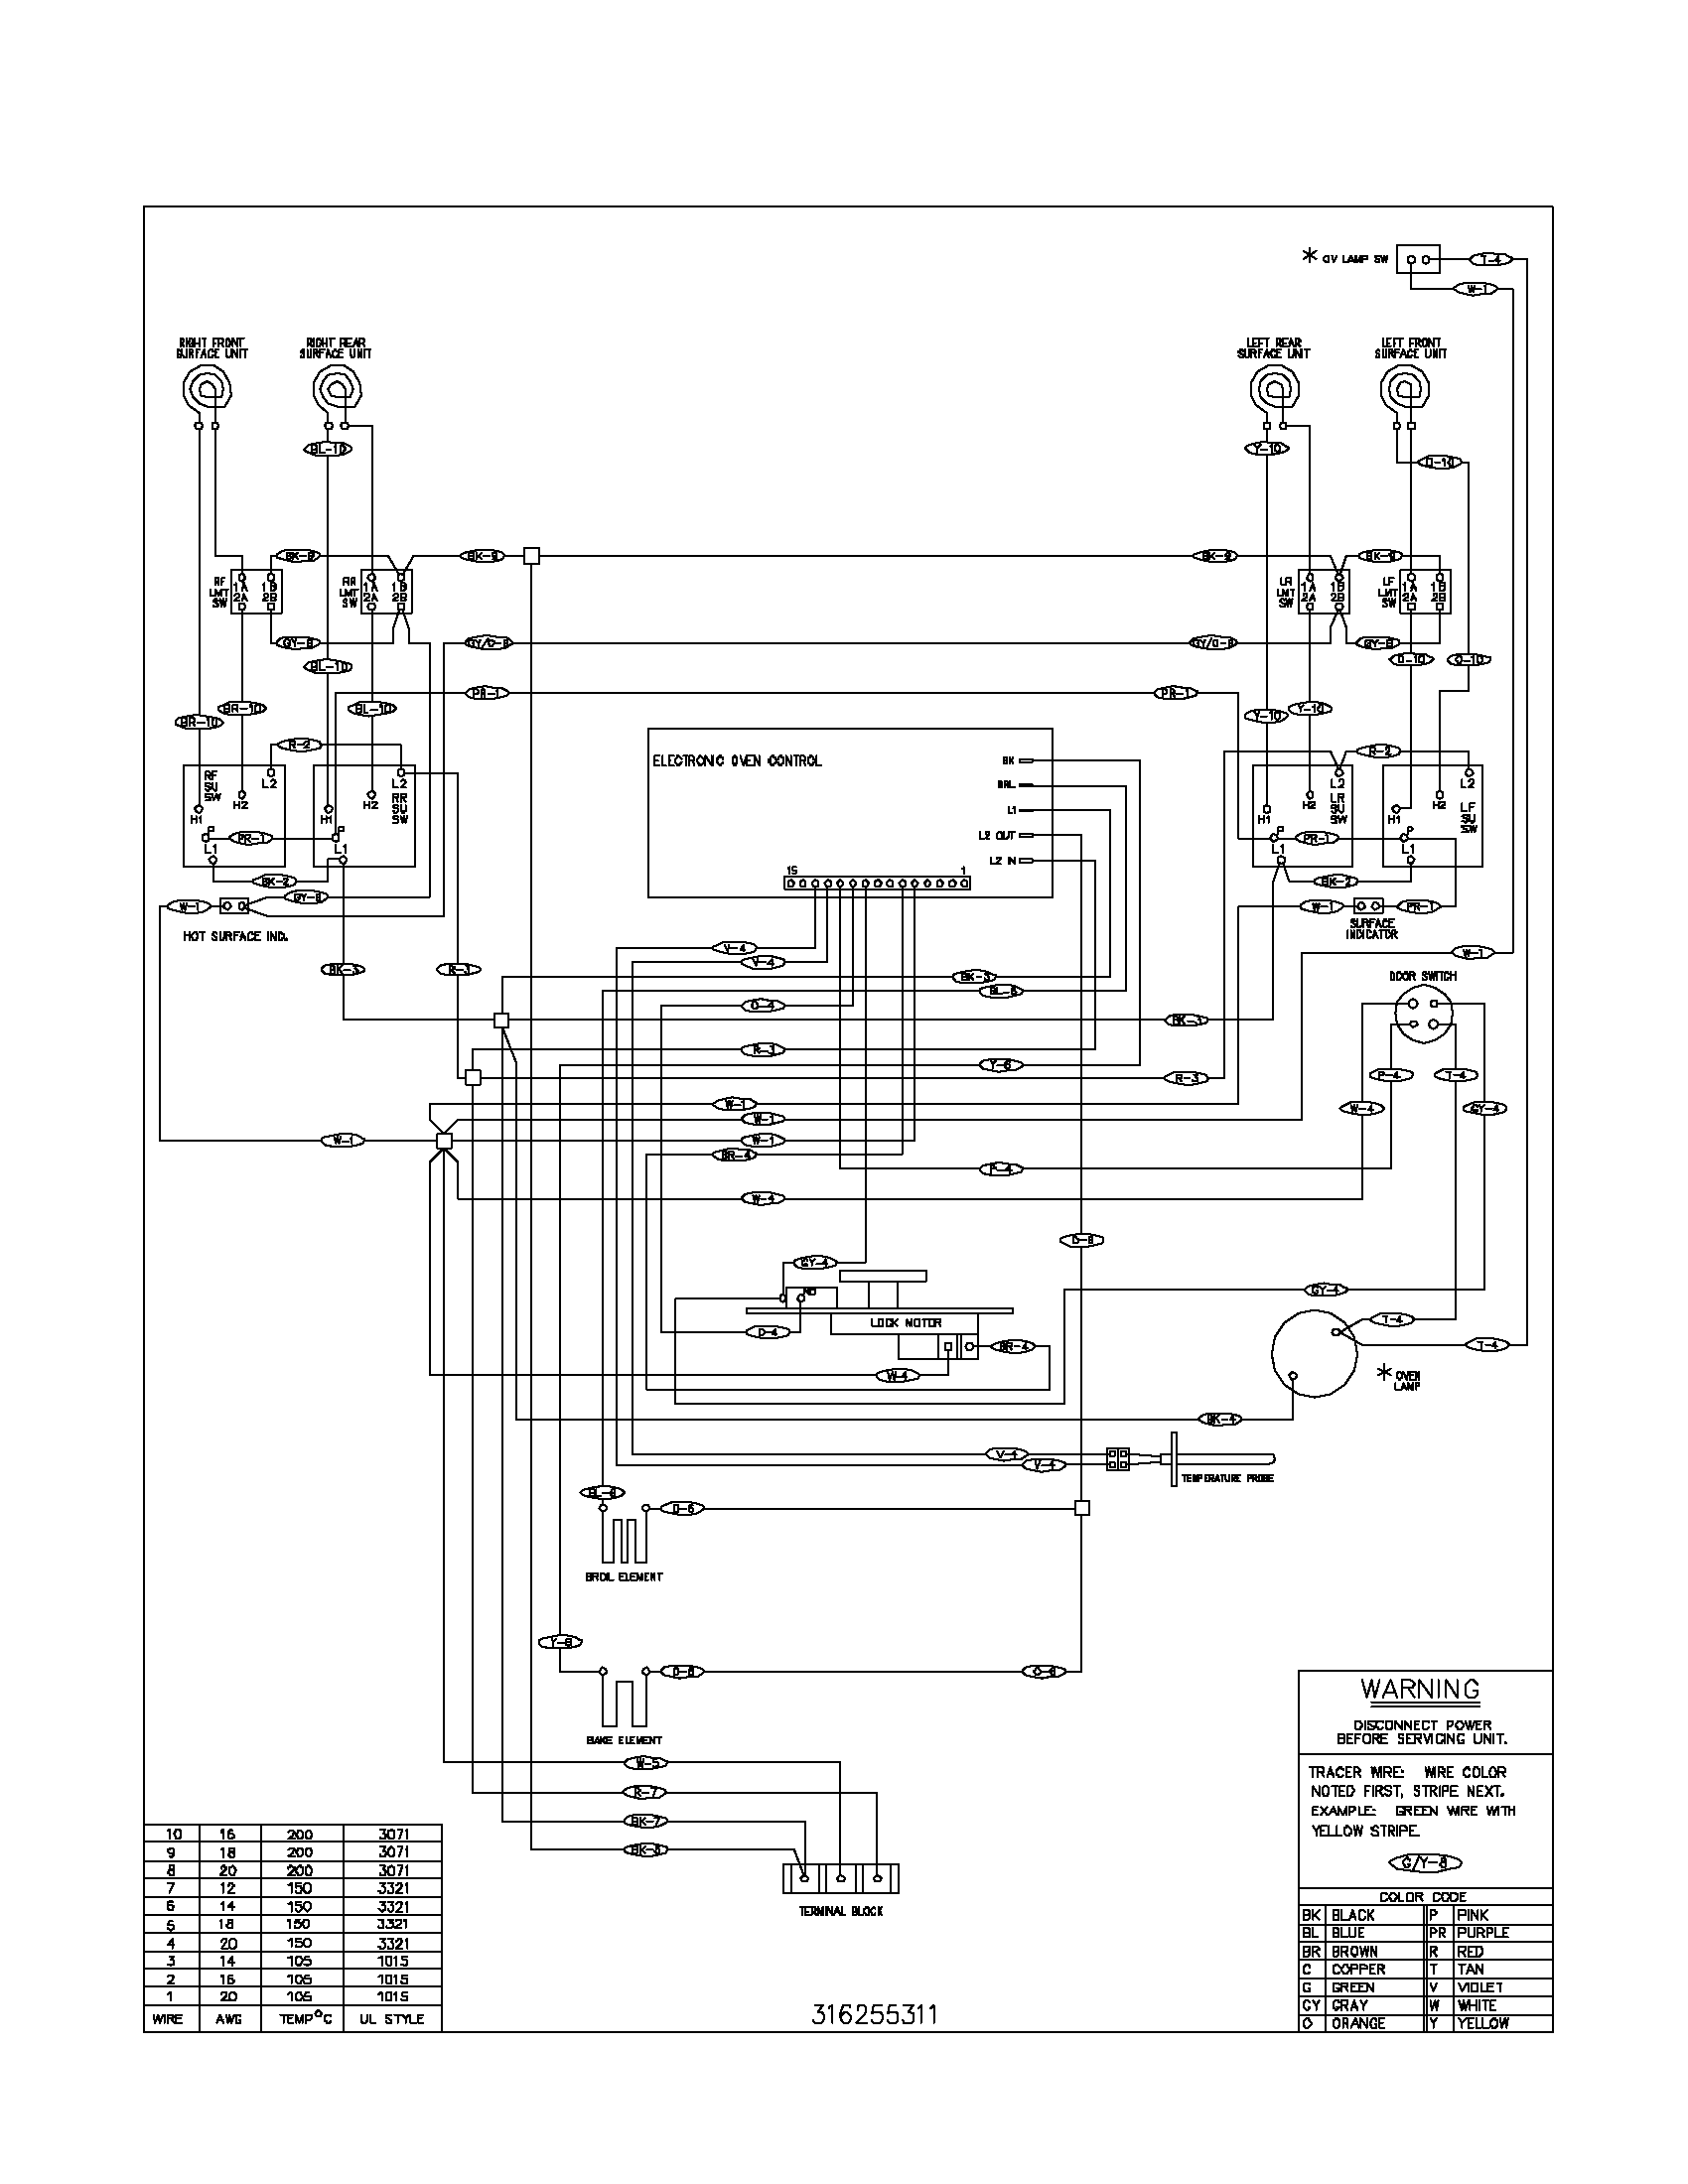 Amana Dryer Lea30aw Wiring Diagram: Wiring Diagram For Amana Dryer Amana Dryer Cord Installation ,Design